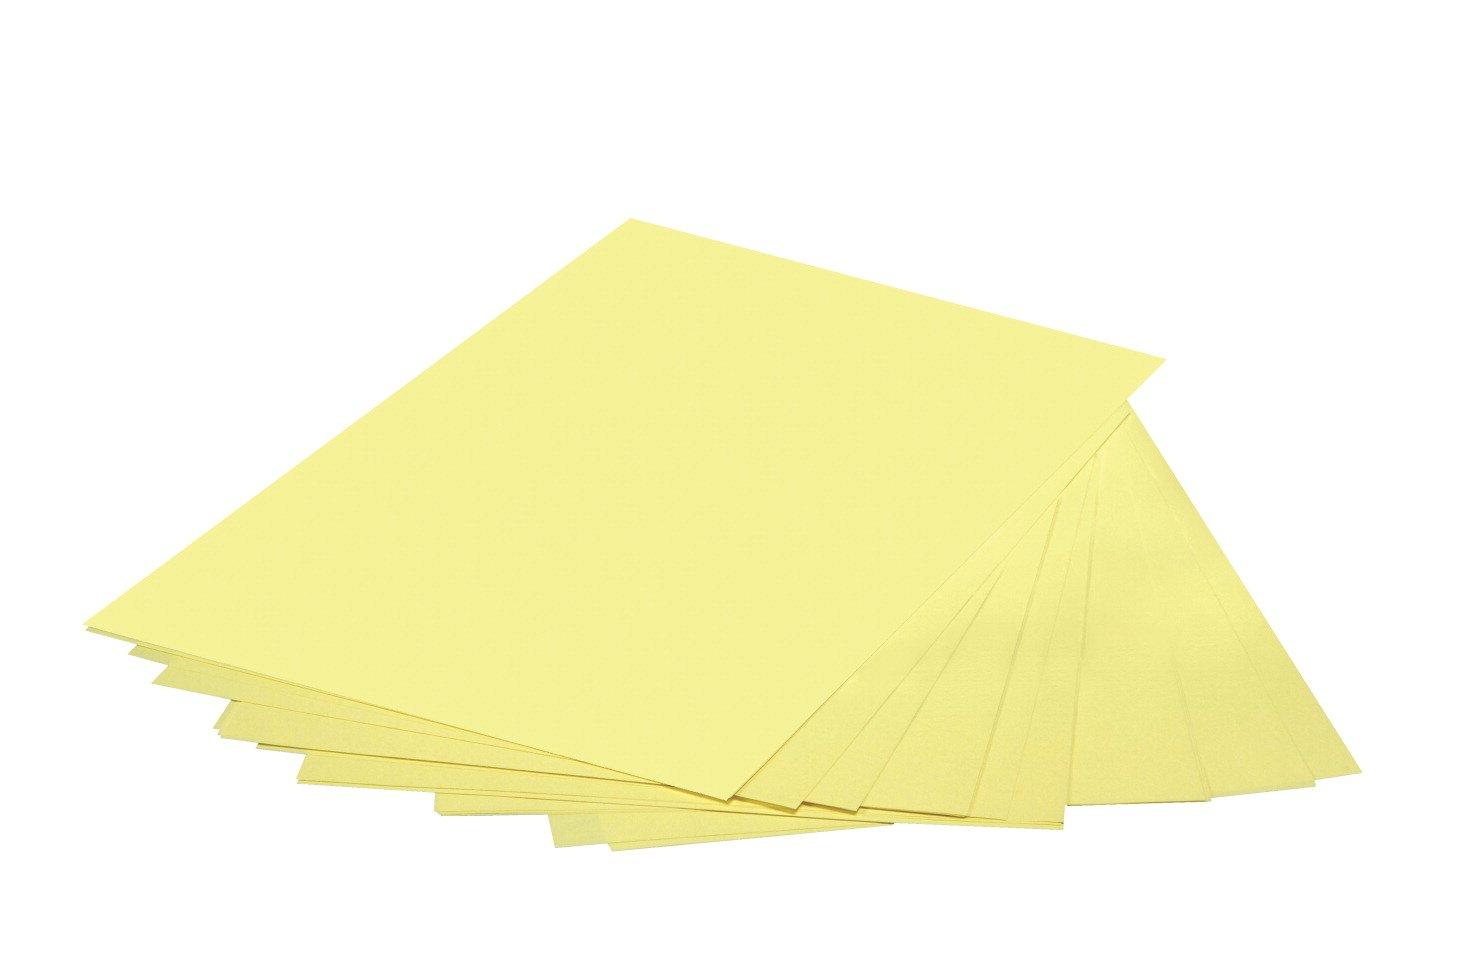 WAU32542 - Wausau Paper Exact Colored Paper